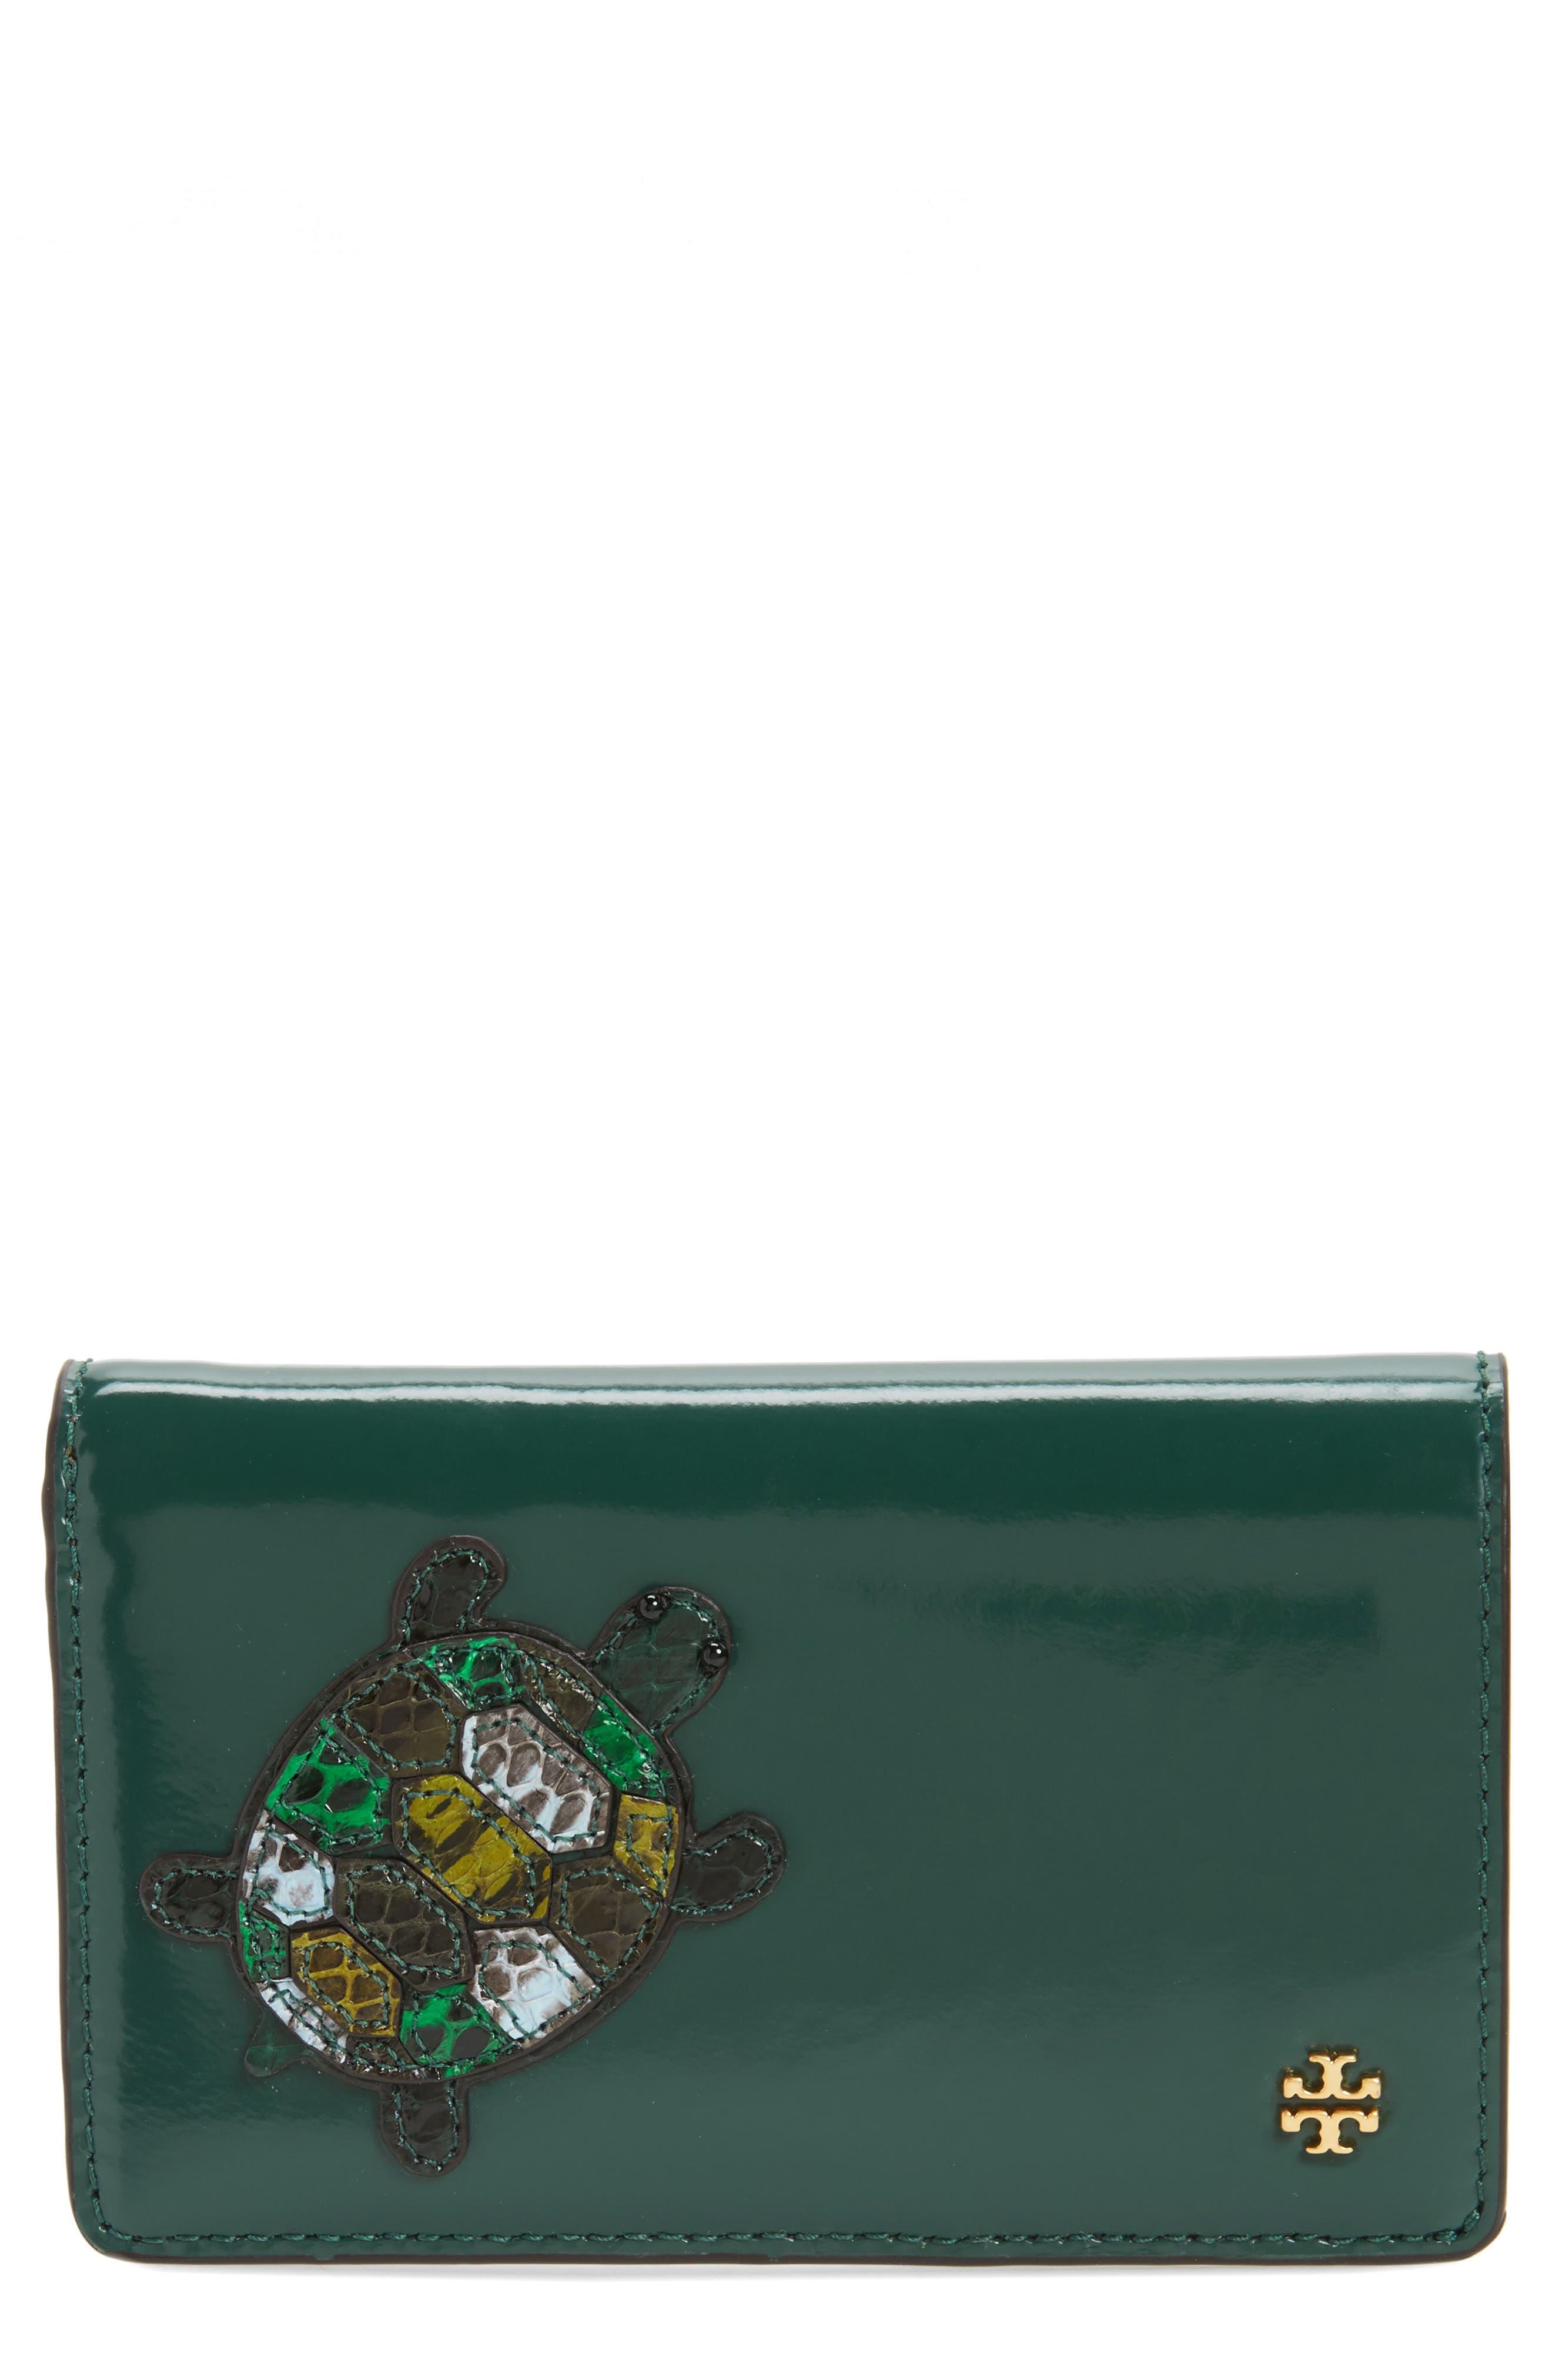 Tory Burch Turtle Genuine Snakeskin & Leather Wallet